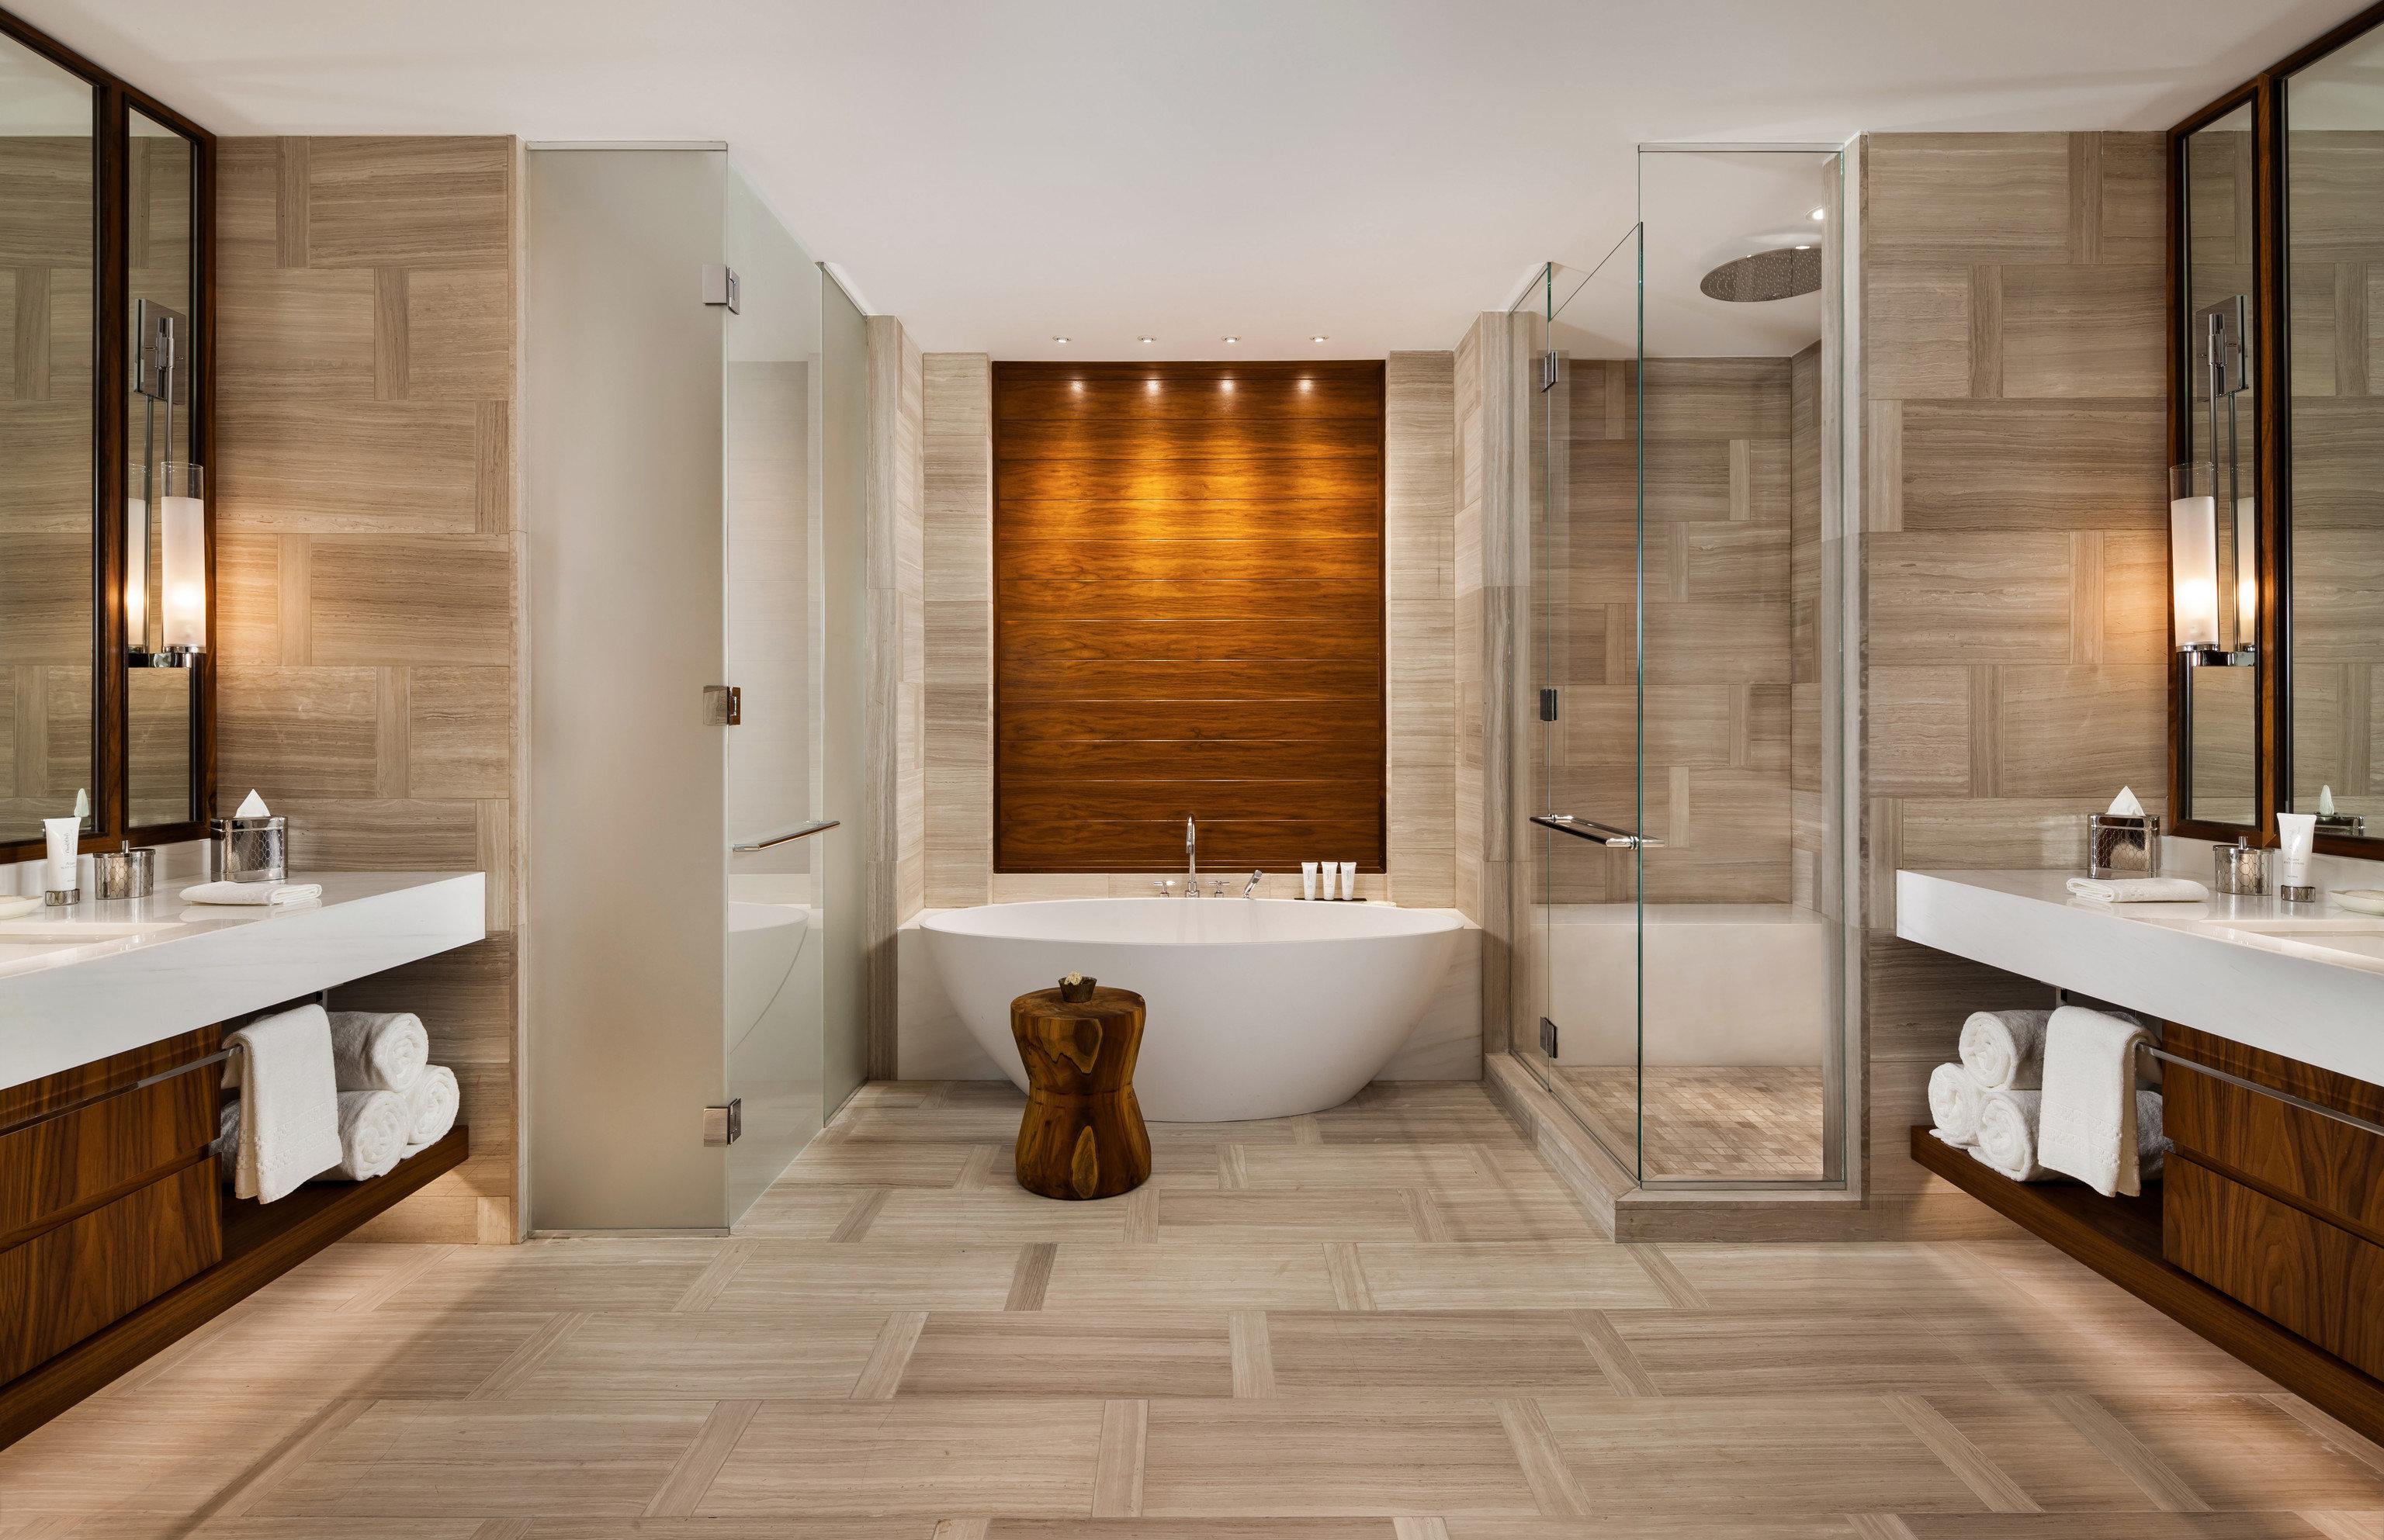 bathroom property flooring hardwood sink wood flooring home Suite tile tub Bath Modern bathtub